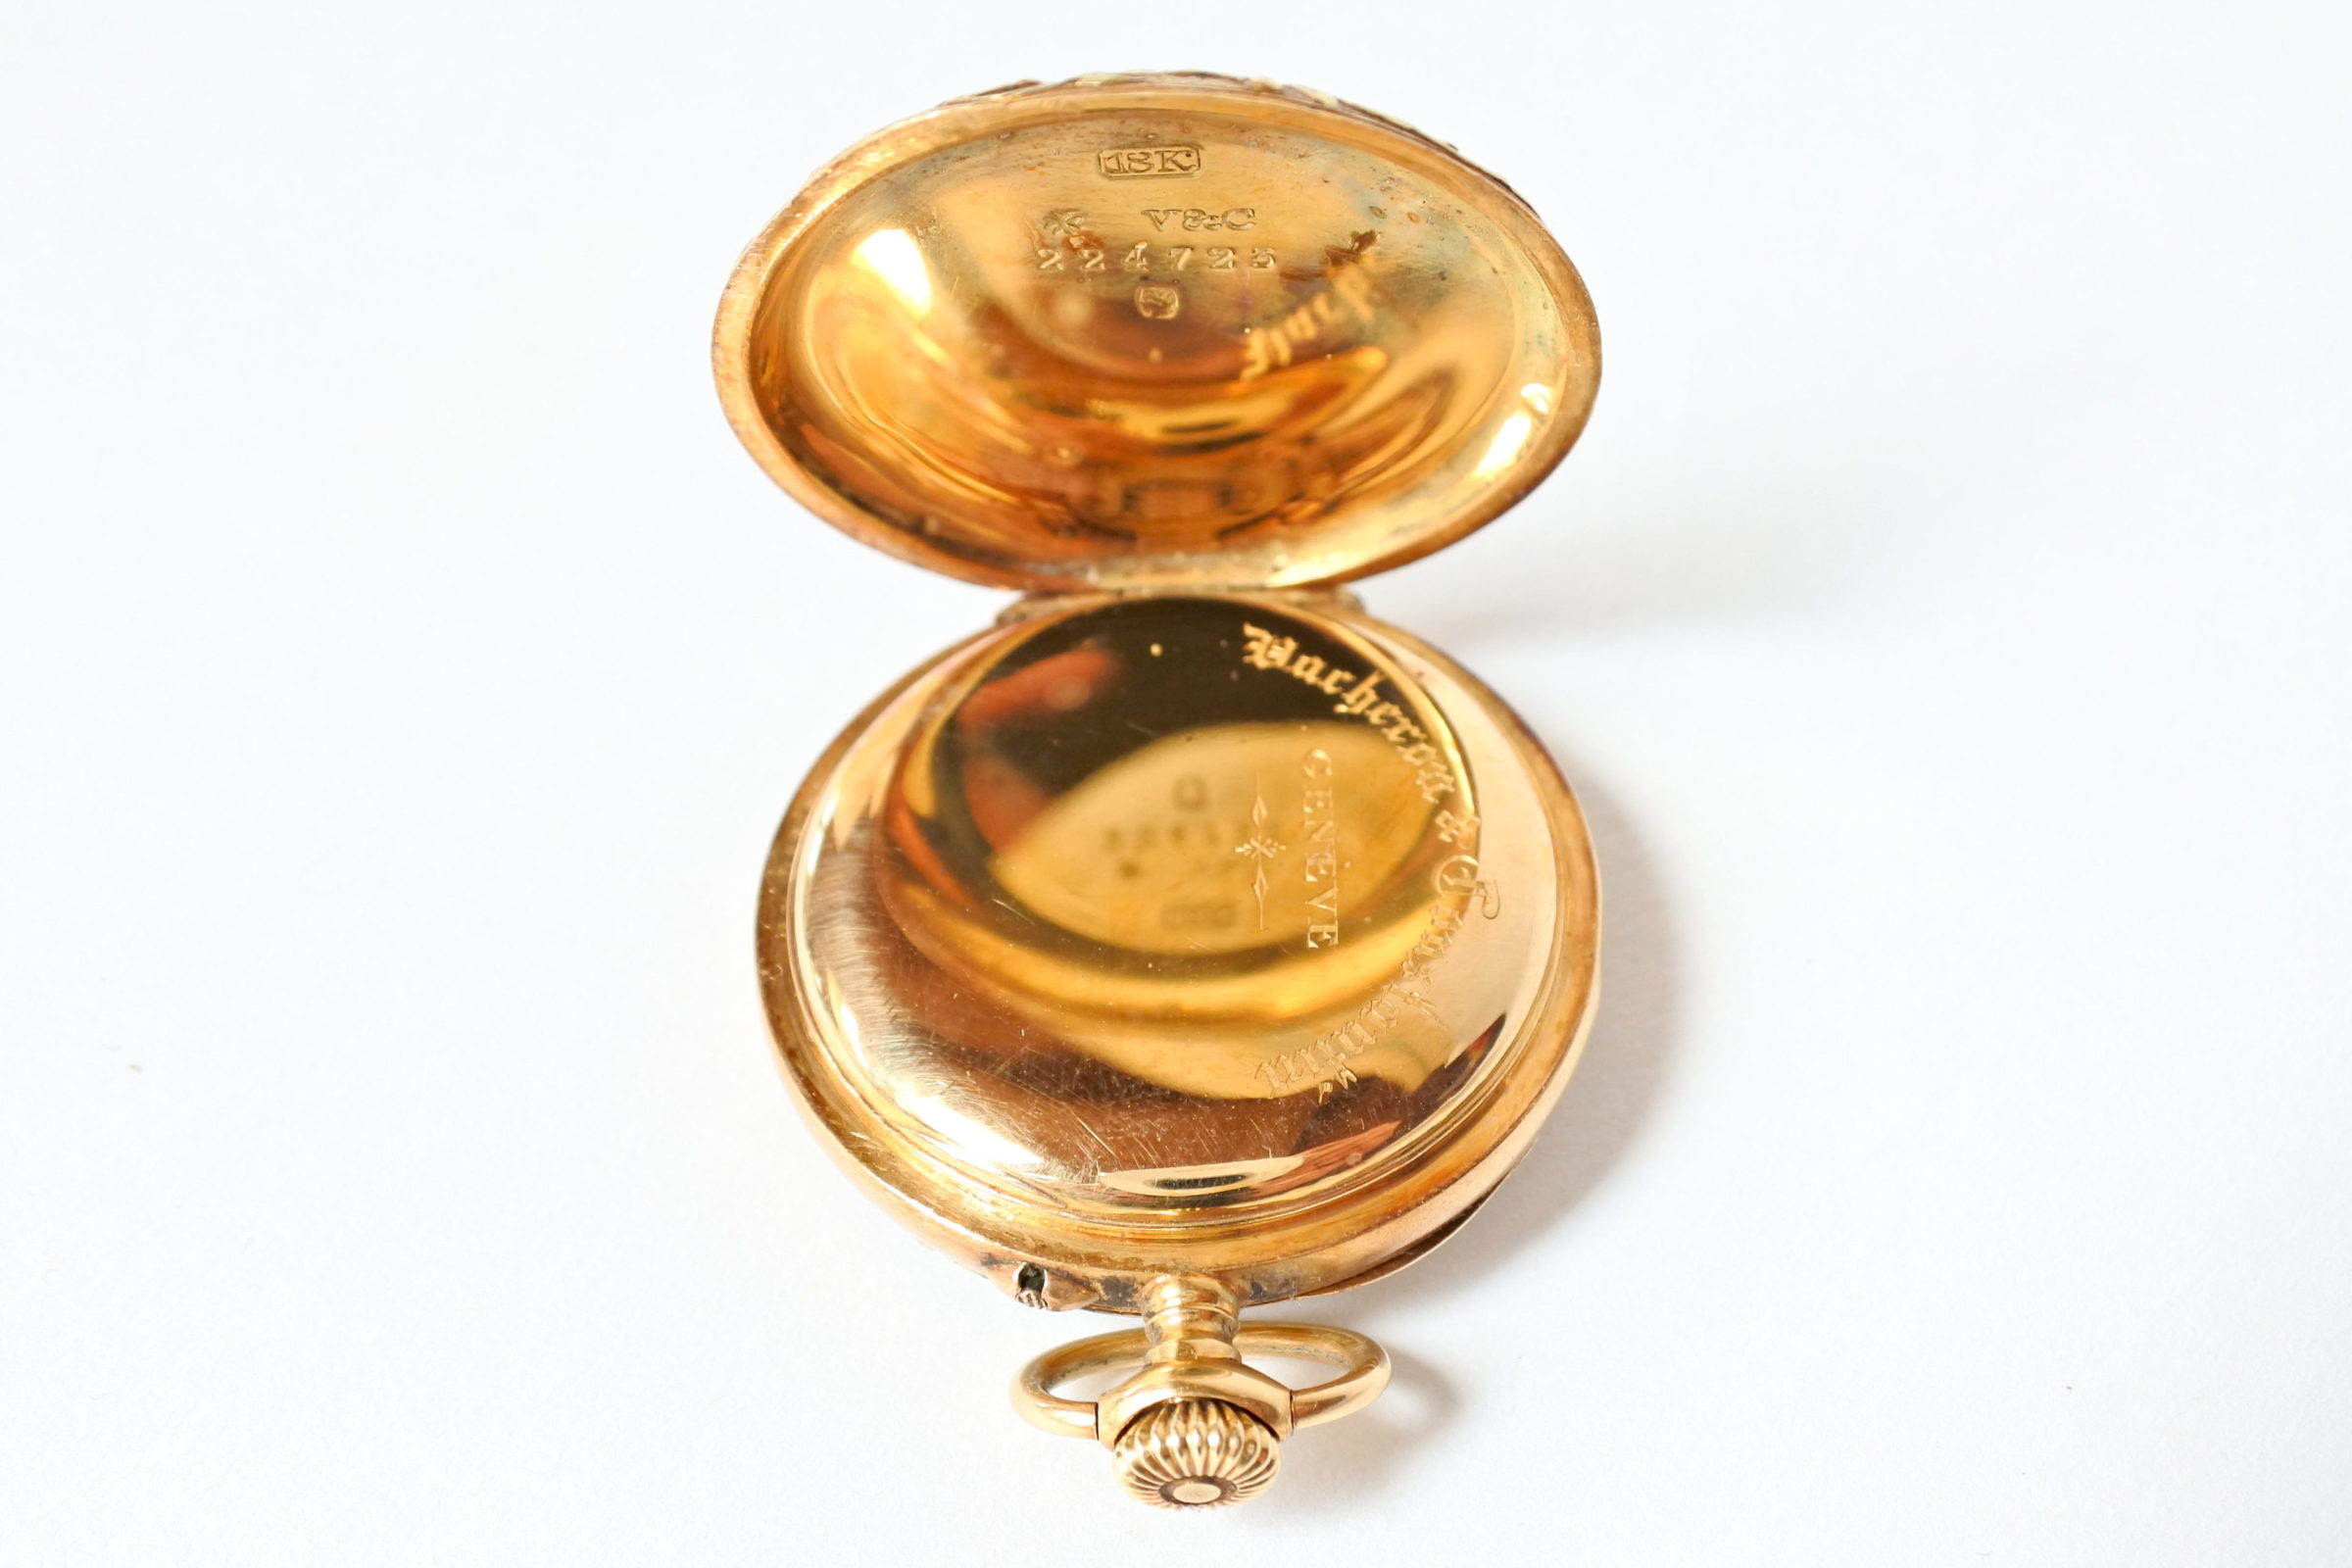 Monachina Vacheron Constantin in oro 18k - 4